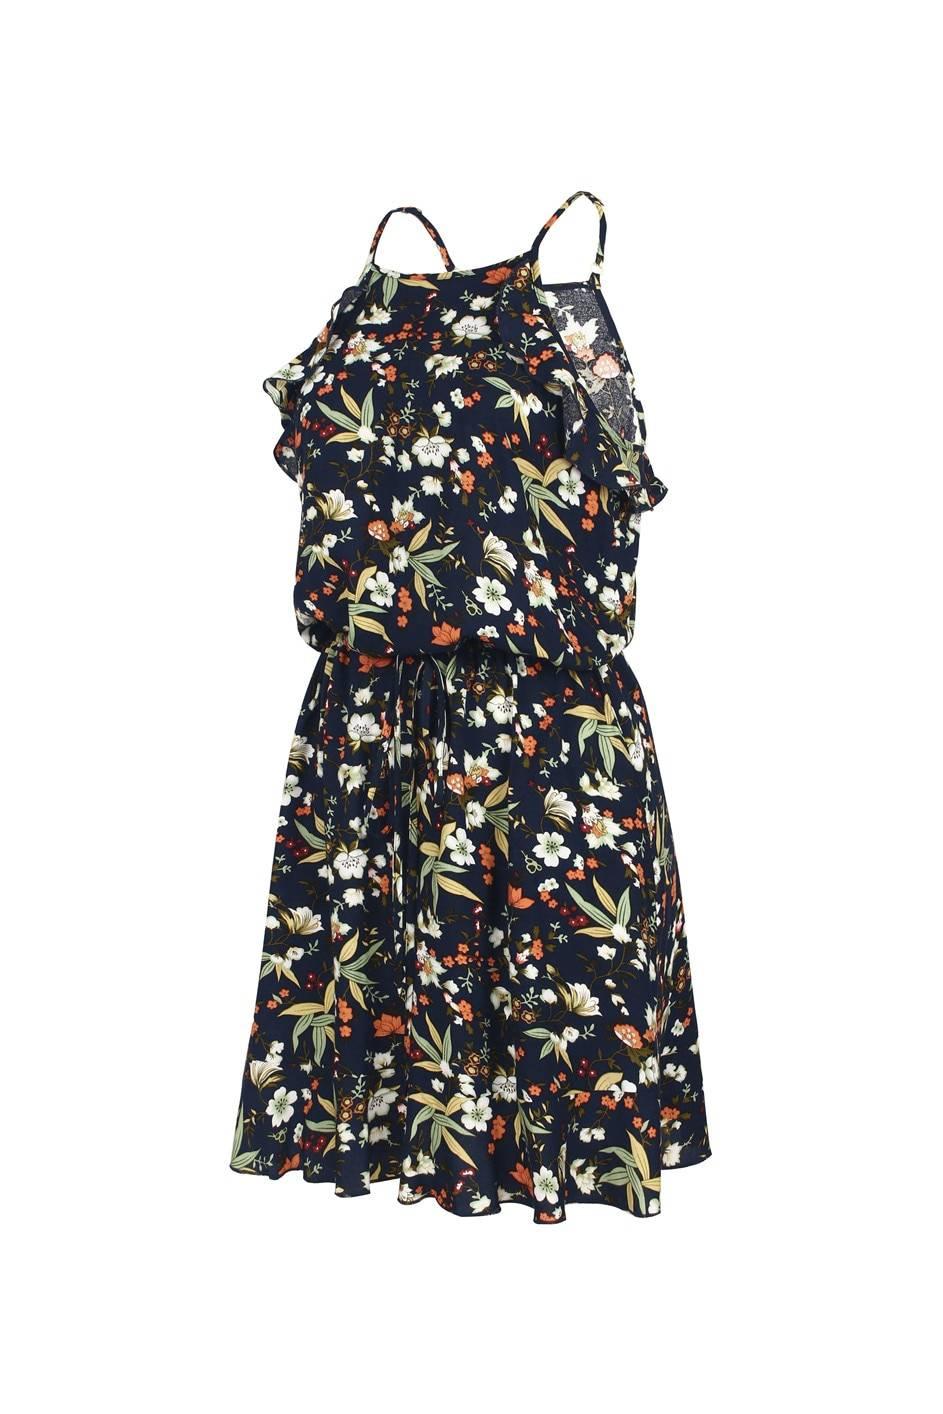 Halter print sleeveless ruffles above knee mini floral dress